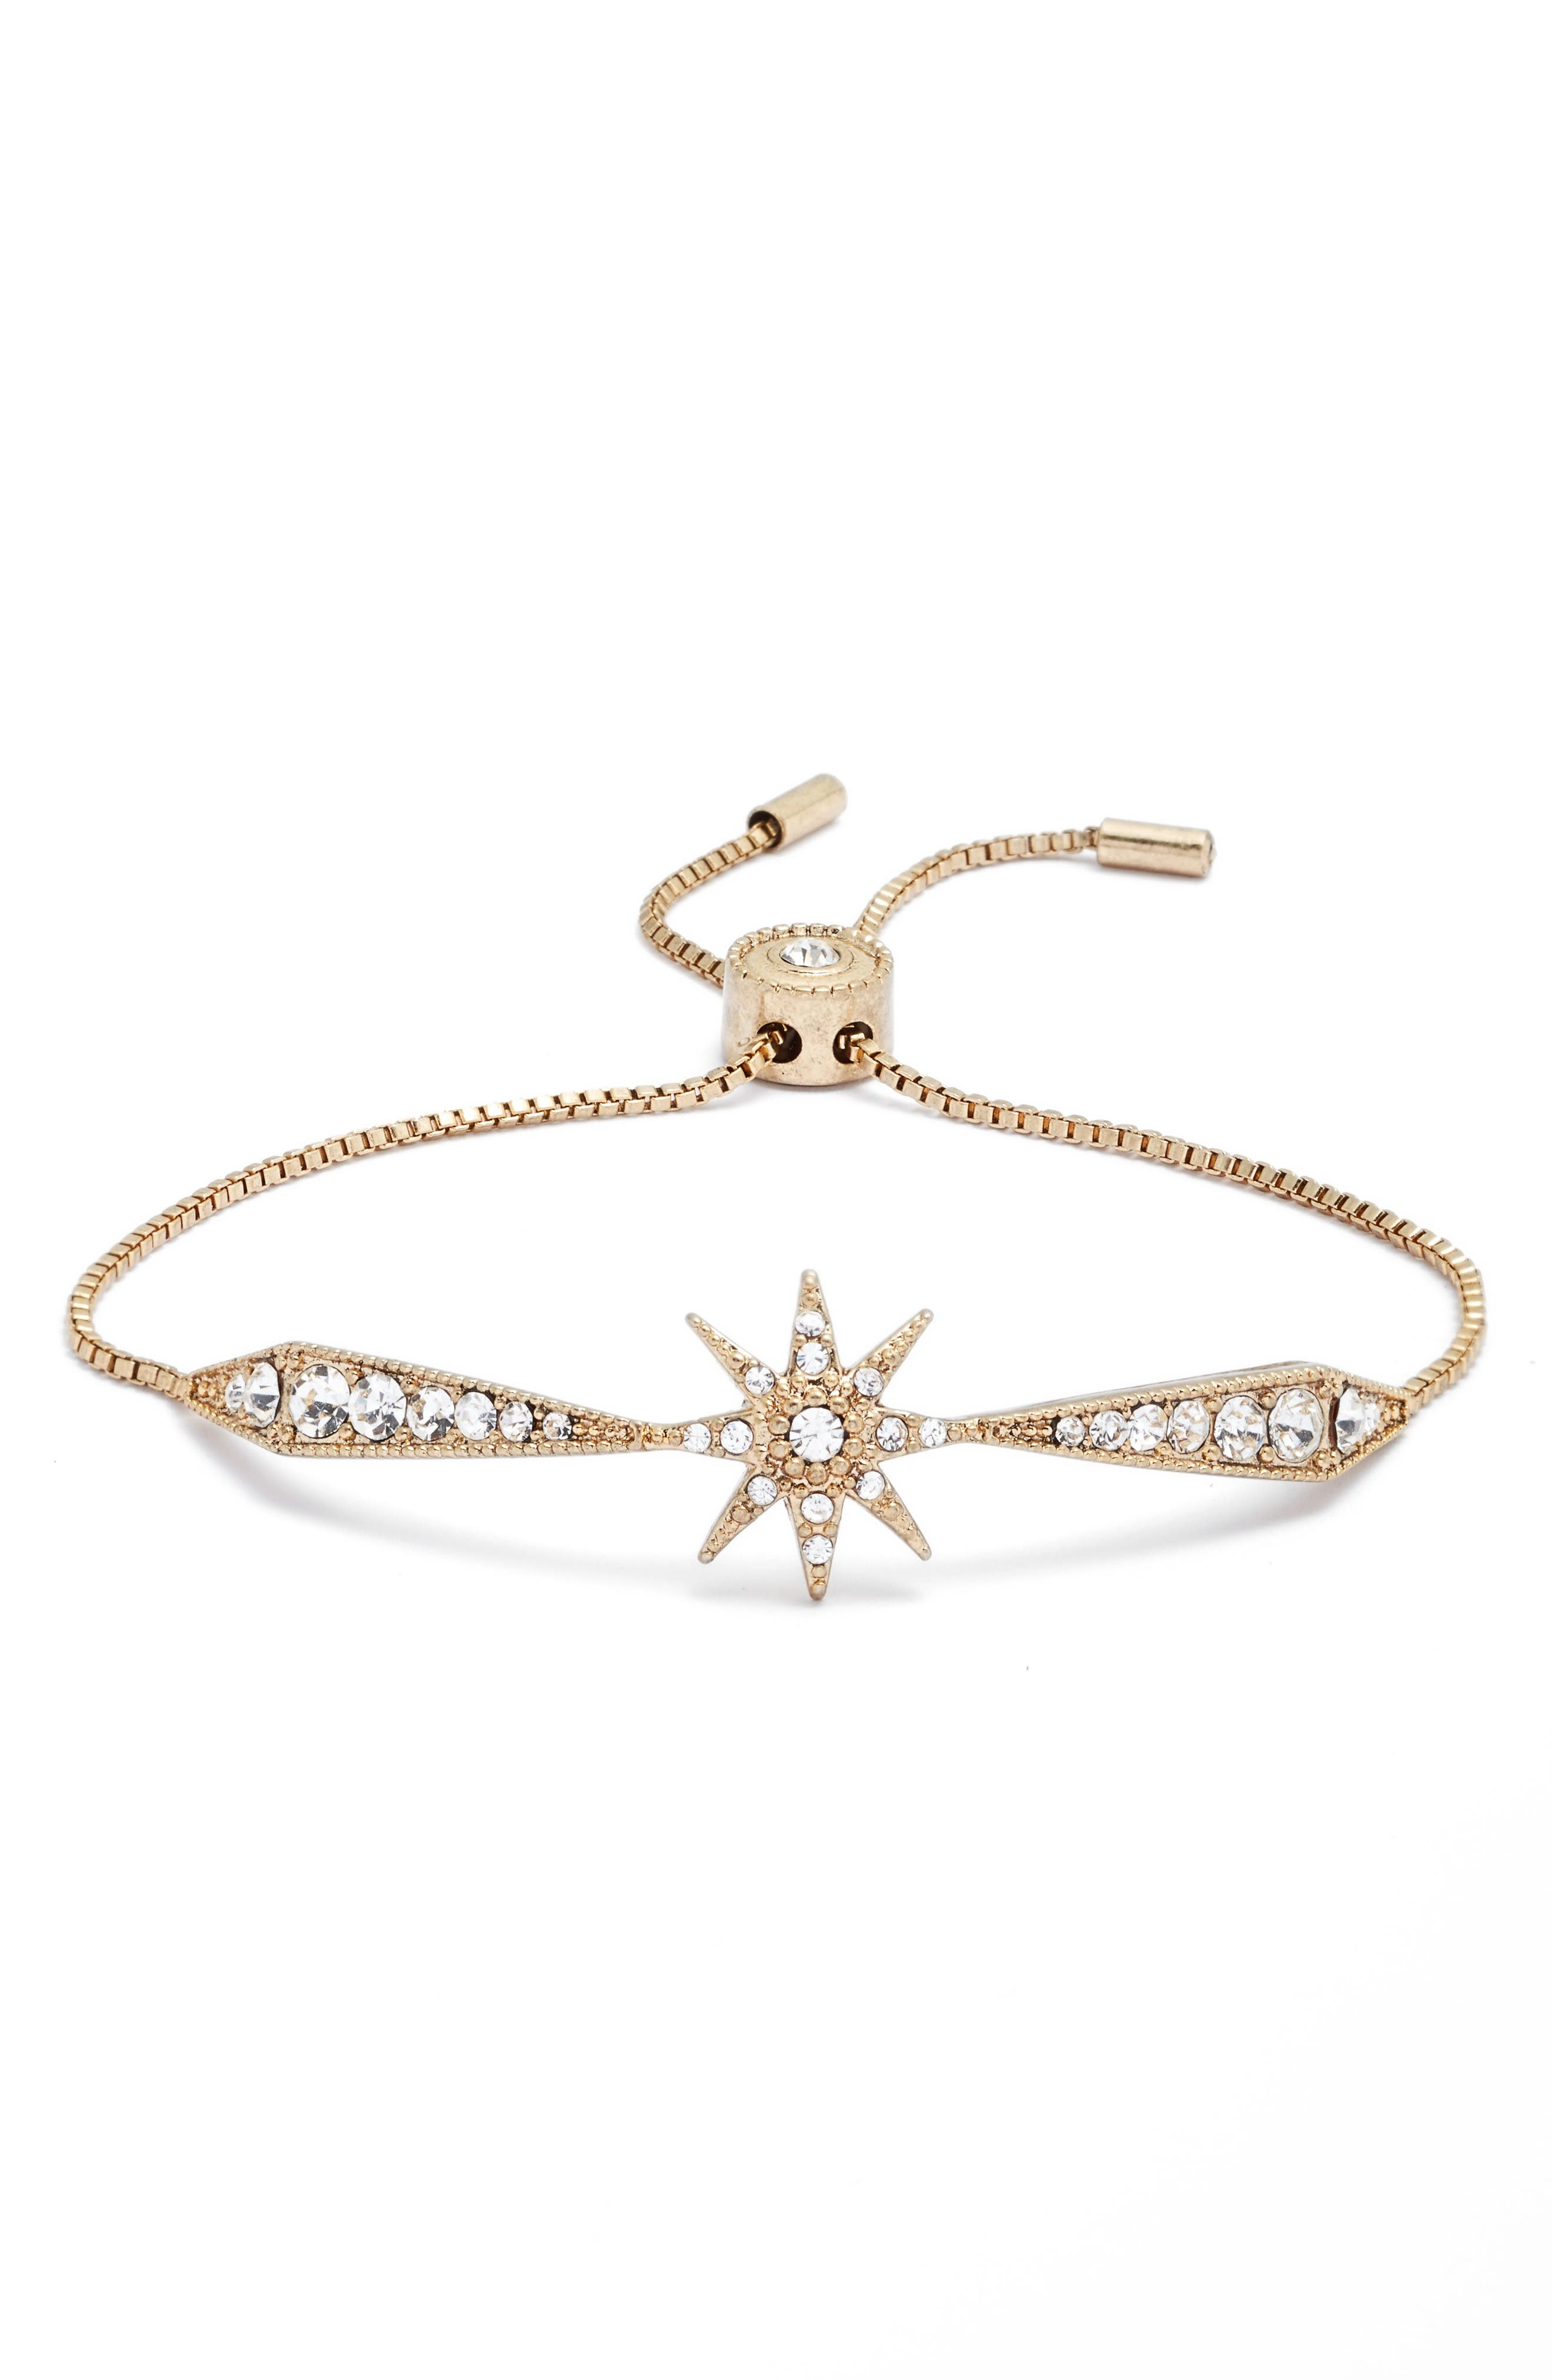 Jenny Packham Stardust Adjustable Crystal Bracelet